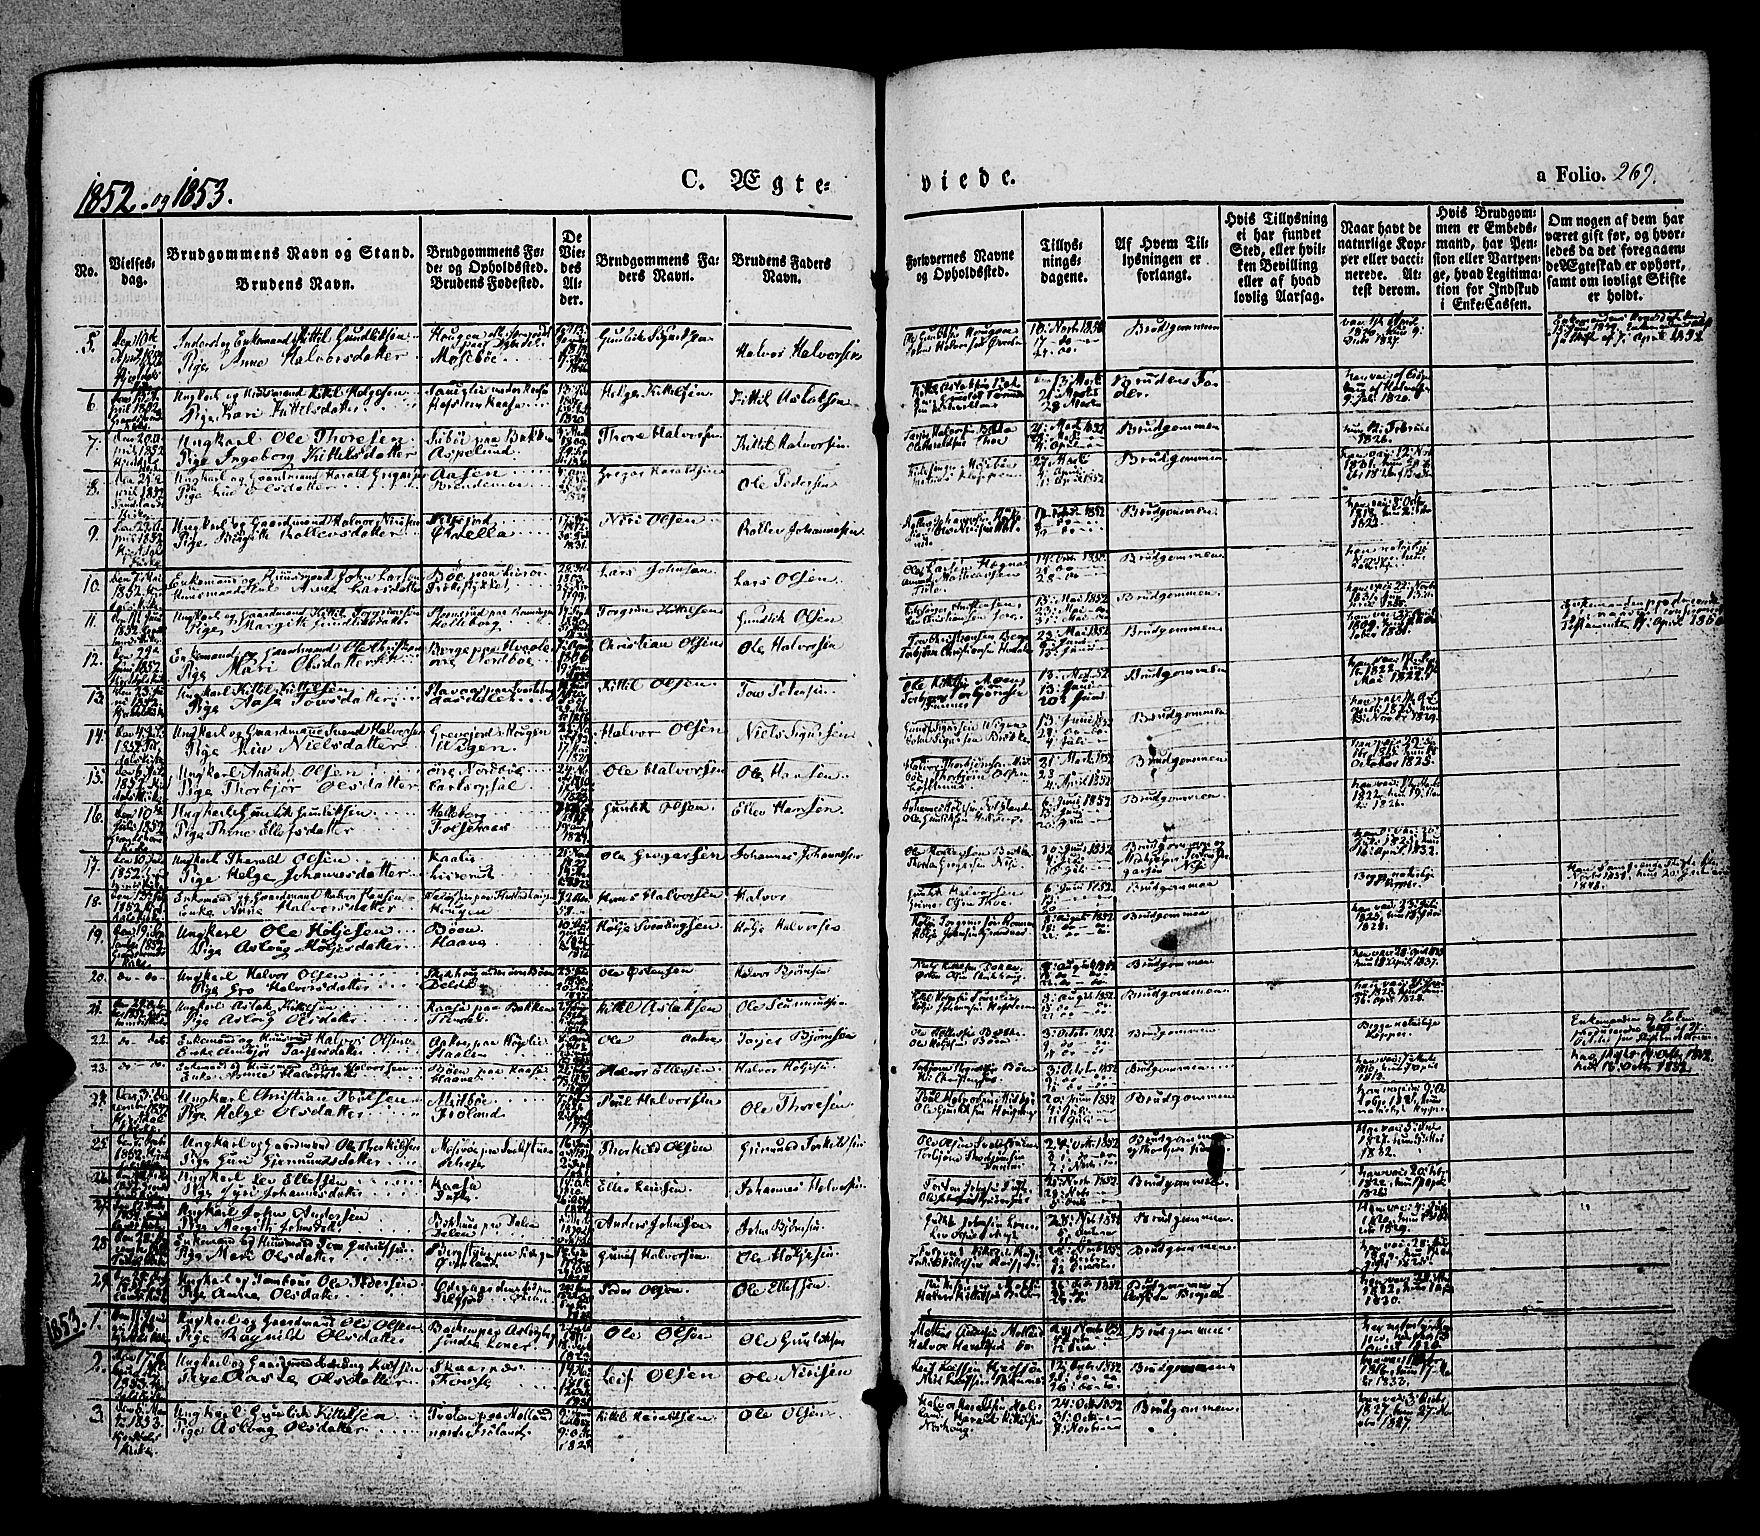 SAKO, Hjartdal kirkebøker, F/Fa/L0008: Ministerialbok nr. I 8, 1844-1859, s. 269